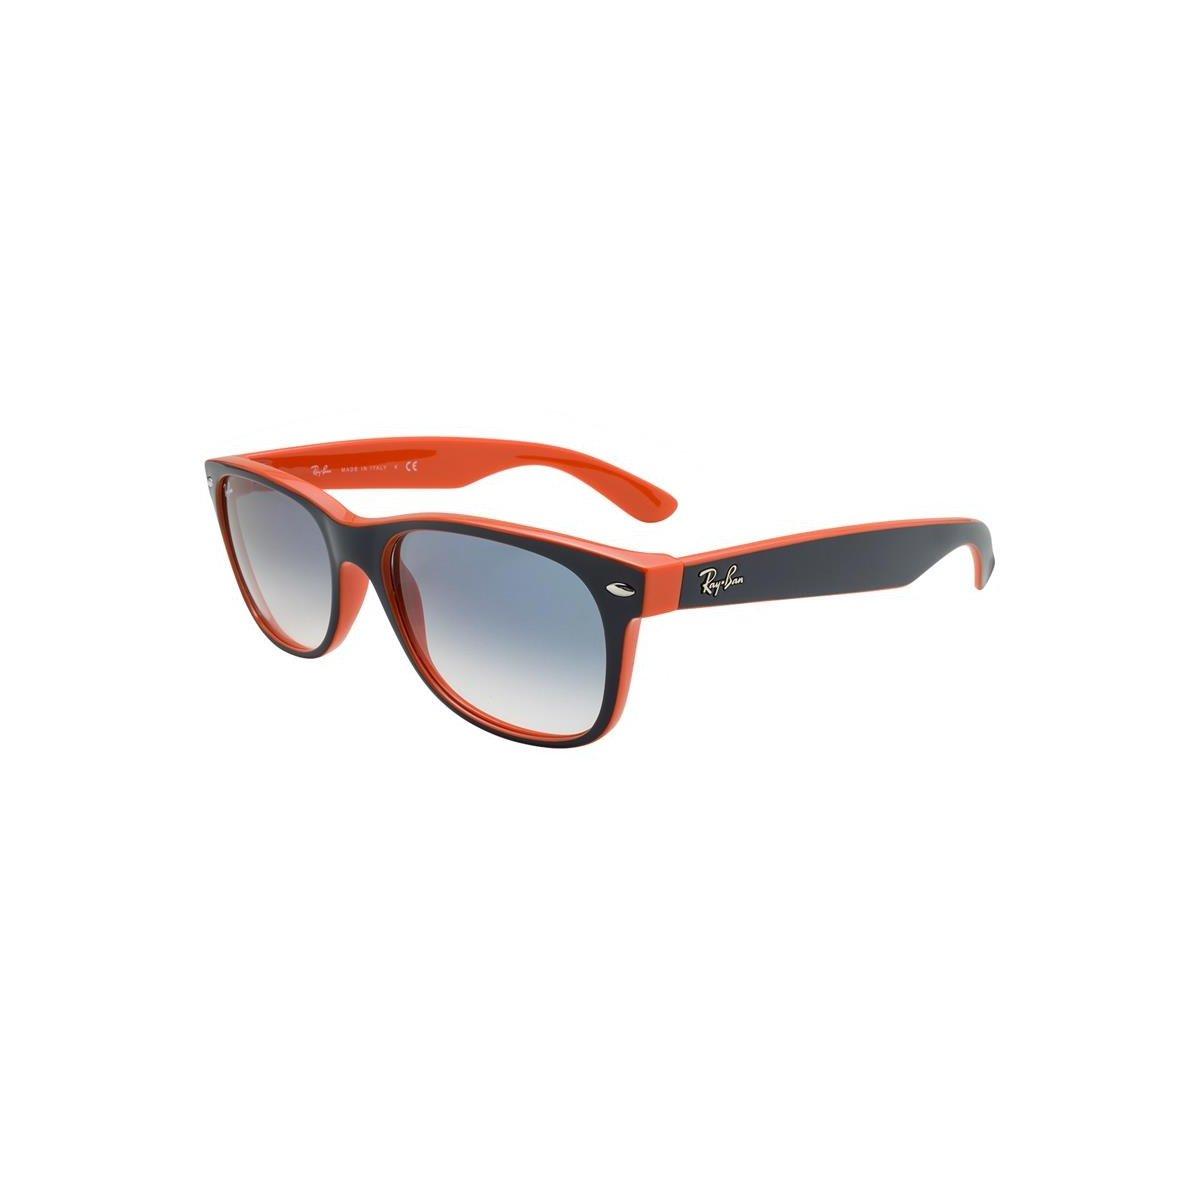 a0909df3514a5 Óculos de Sol Ray Ban RB2132 New Wayfarer - Compre Agora   Netshoes